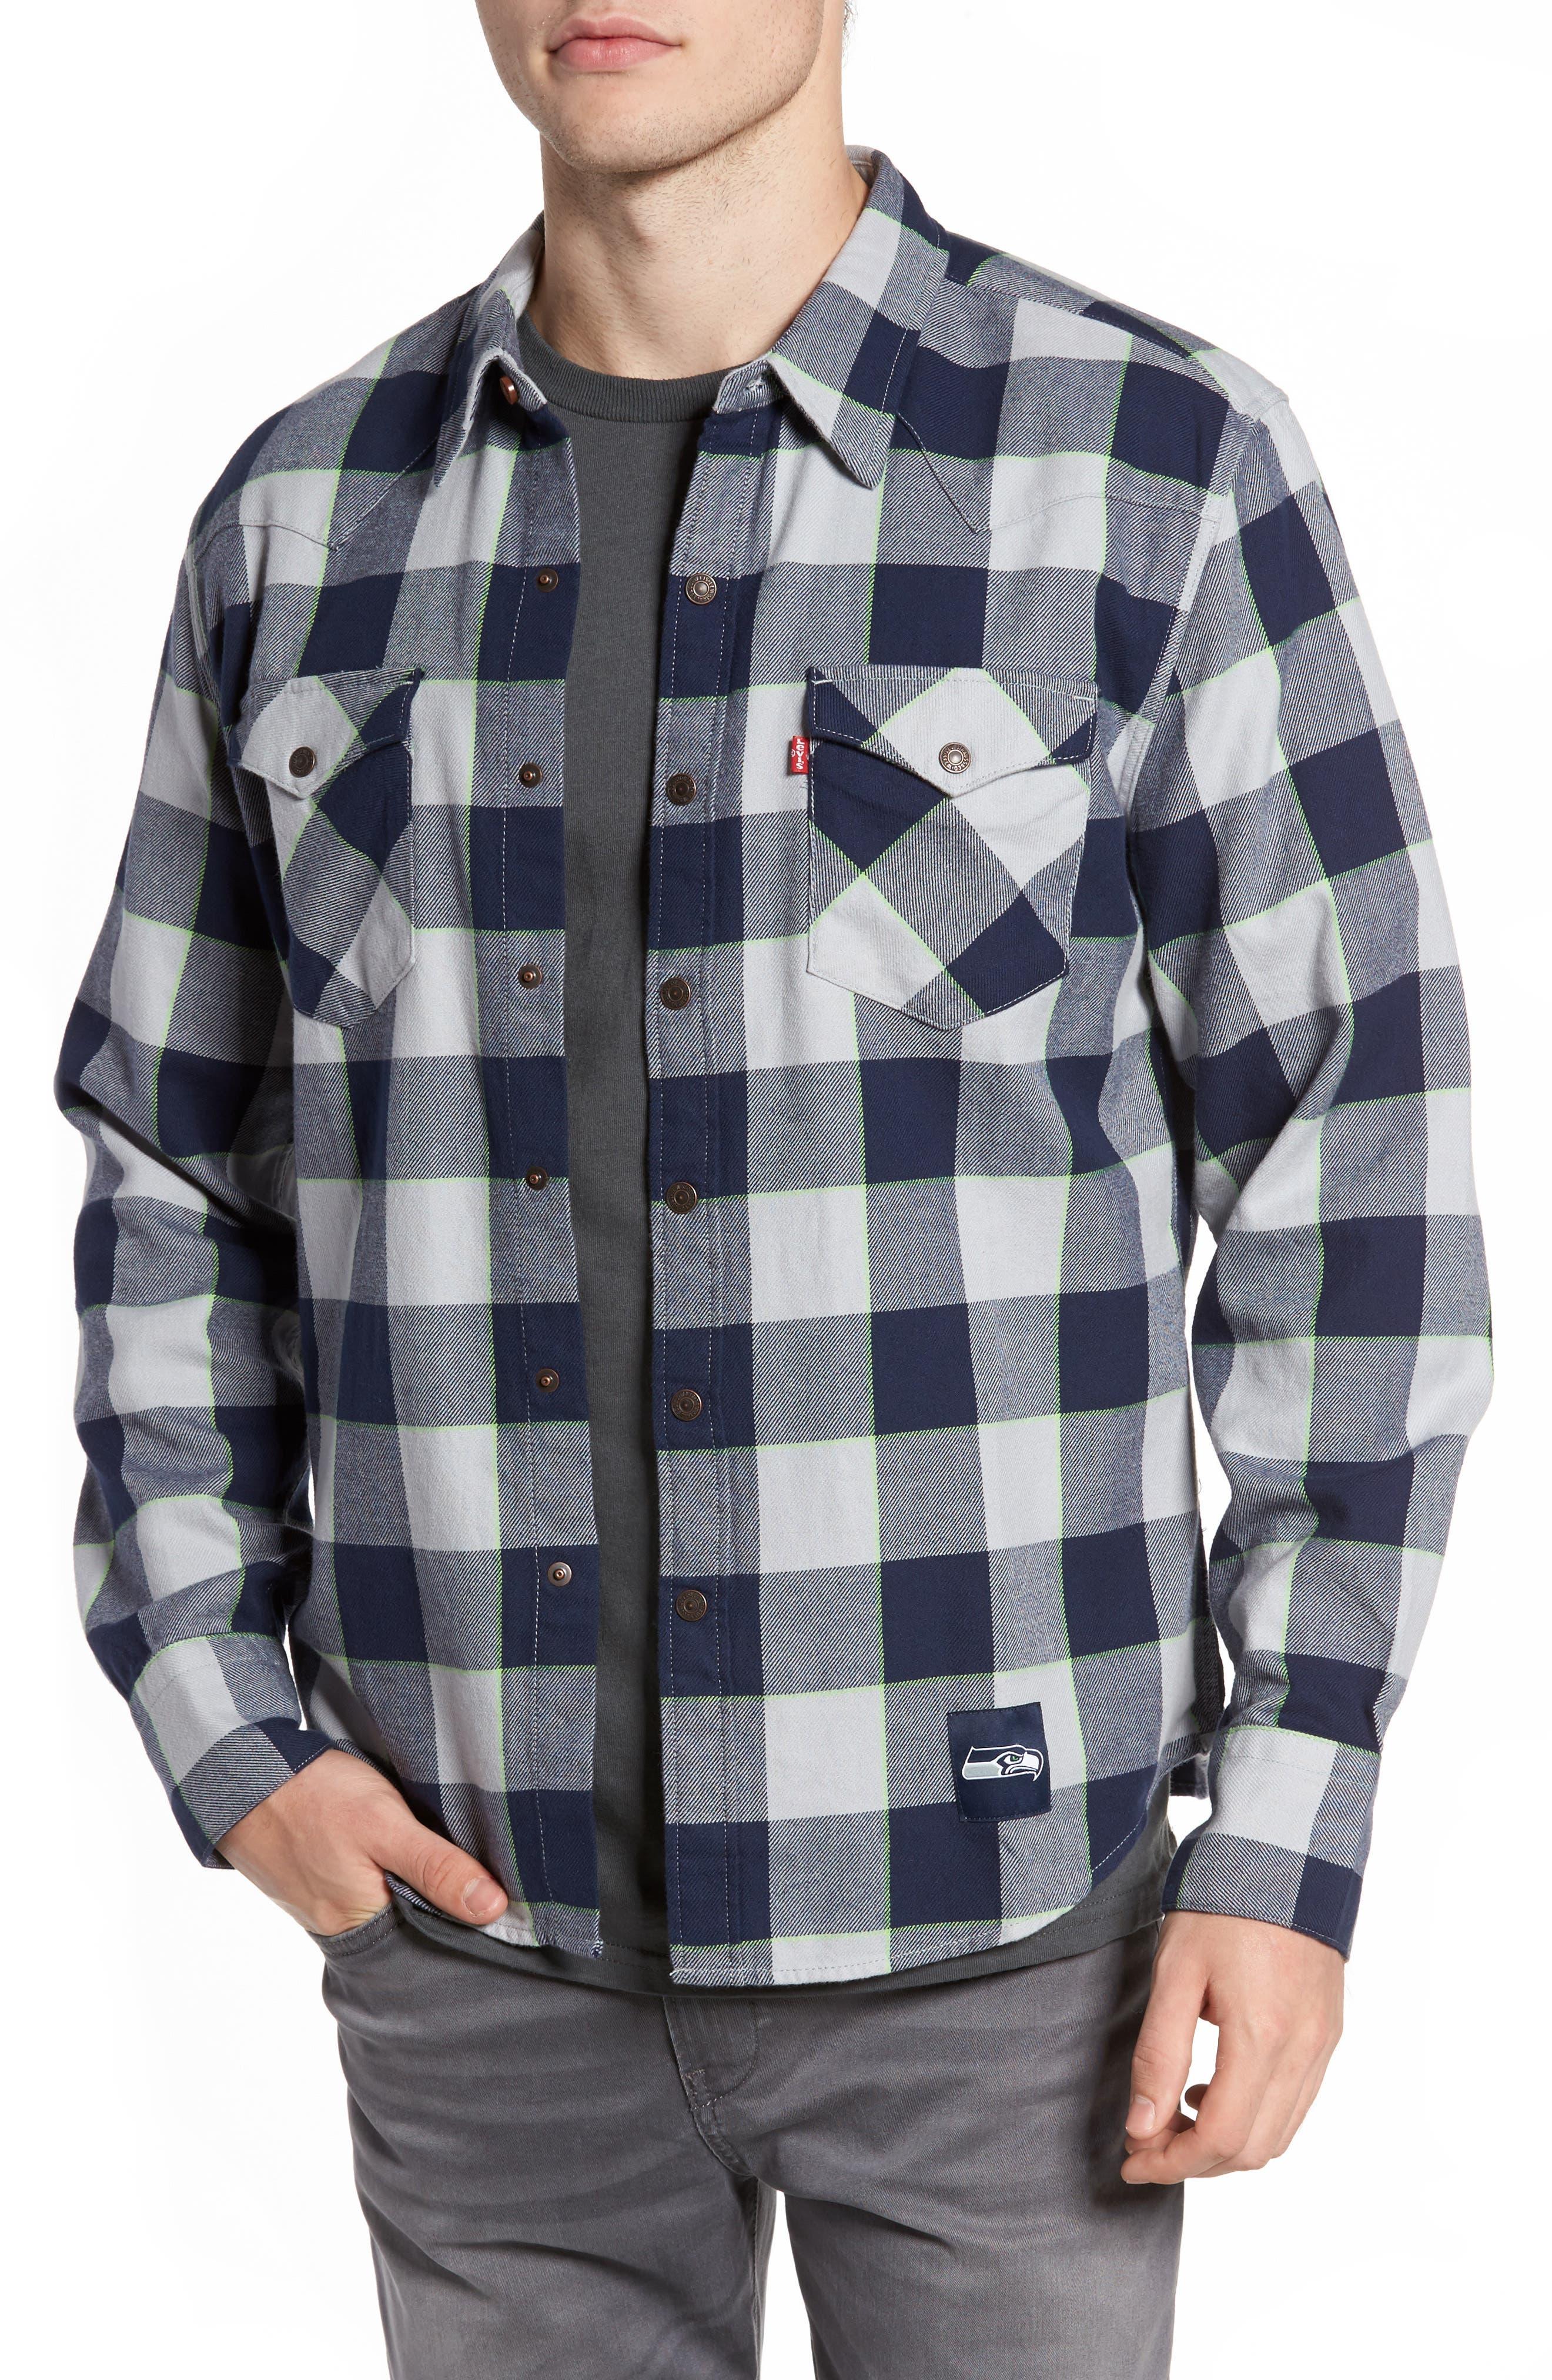 NFL Seahawks - Barstow Plaid Western Shirt,                         Main,                         color,